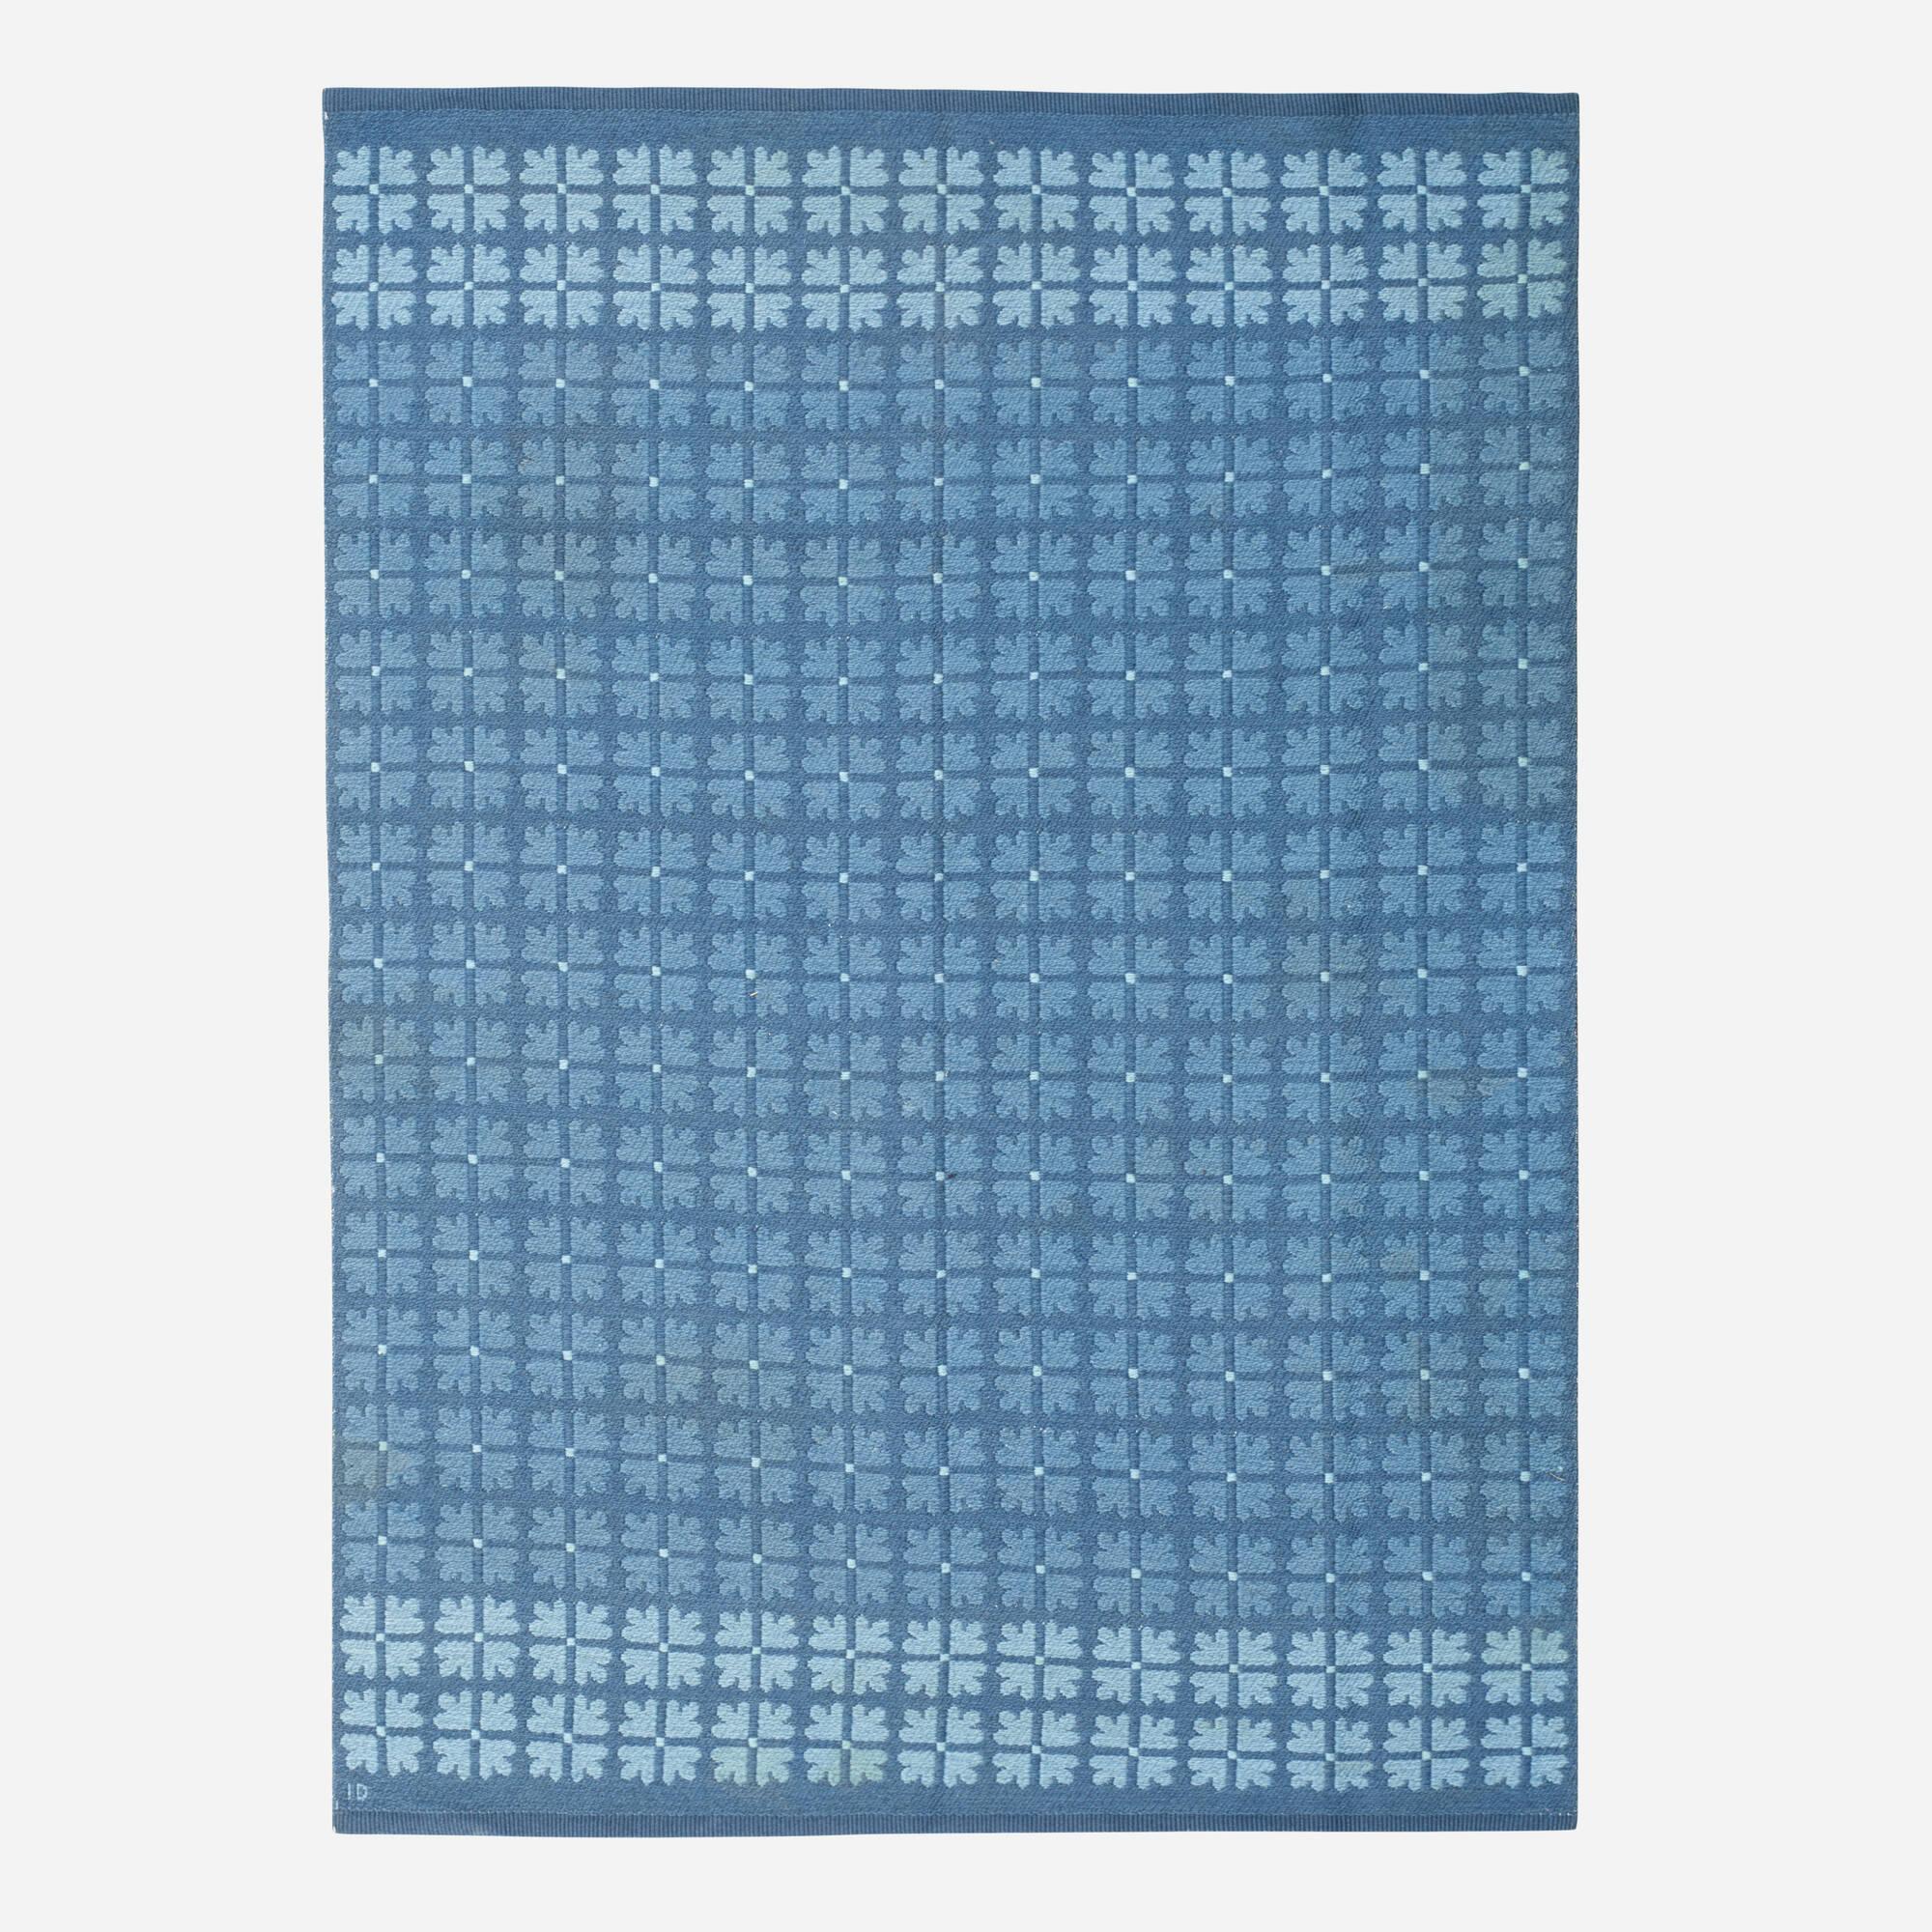 238: Ingrid Dessau / reversible flatweave carpet (3 of 3)